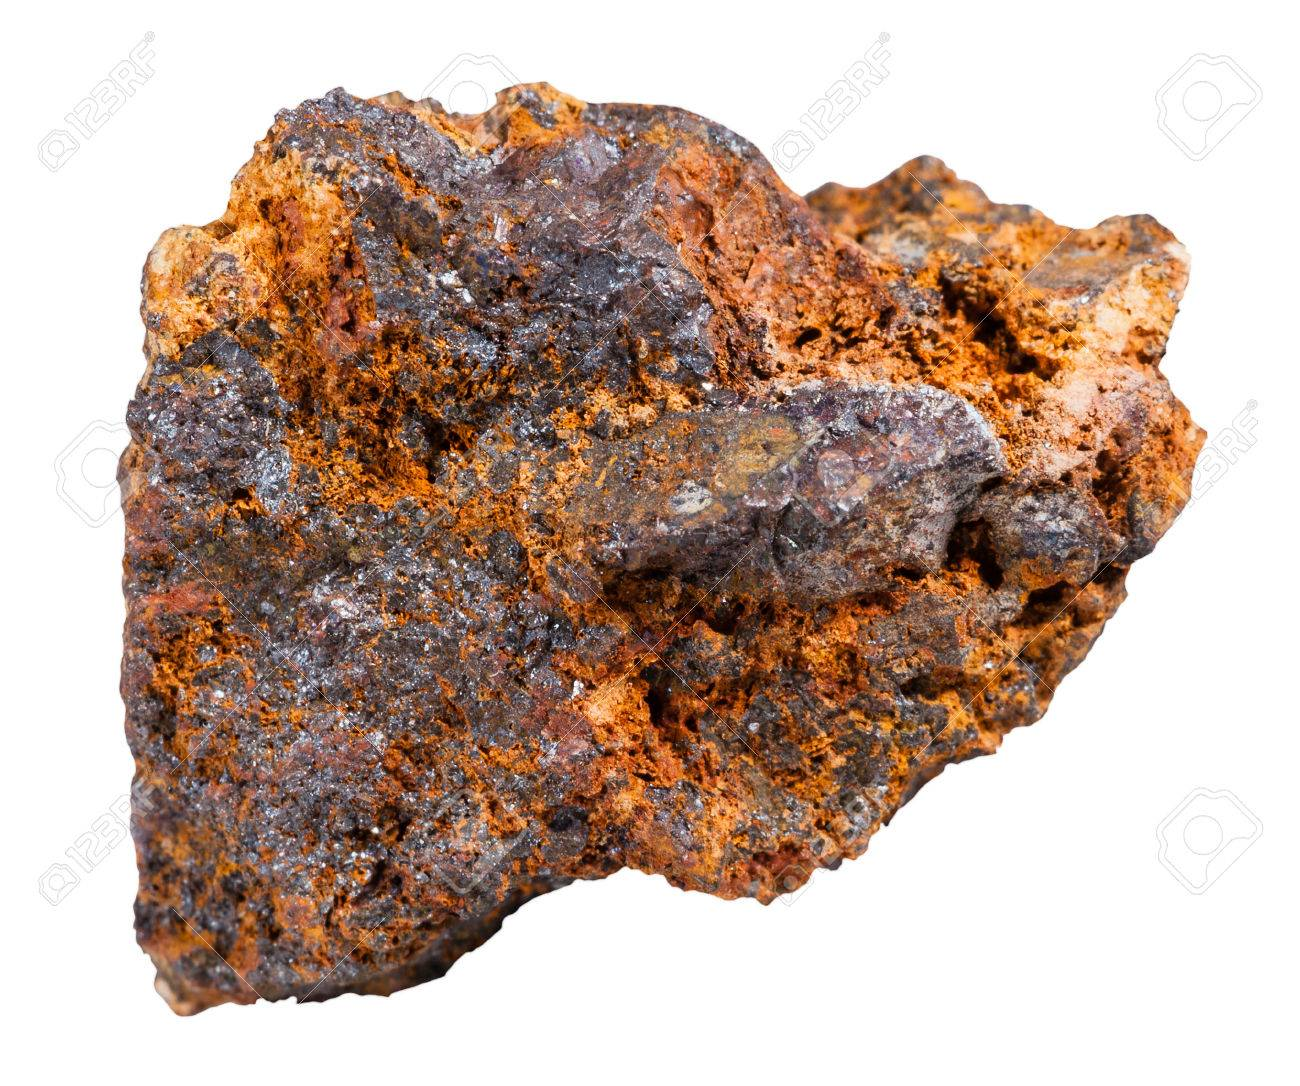 macro shooting of specimen natural rock - piece of hematite (haematite,  iron ore)